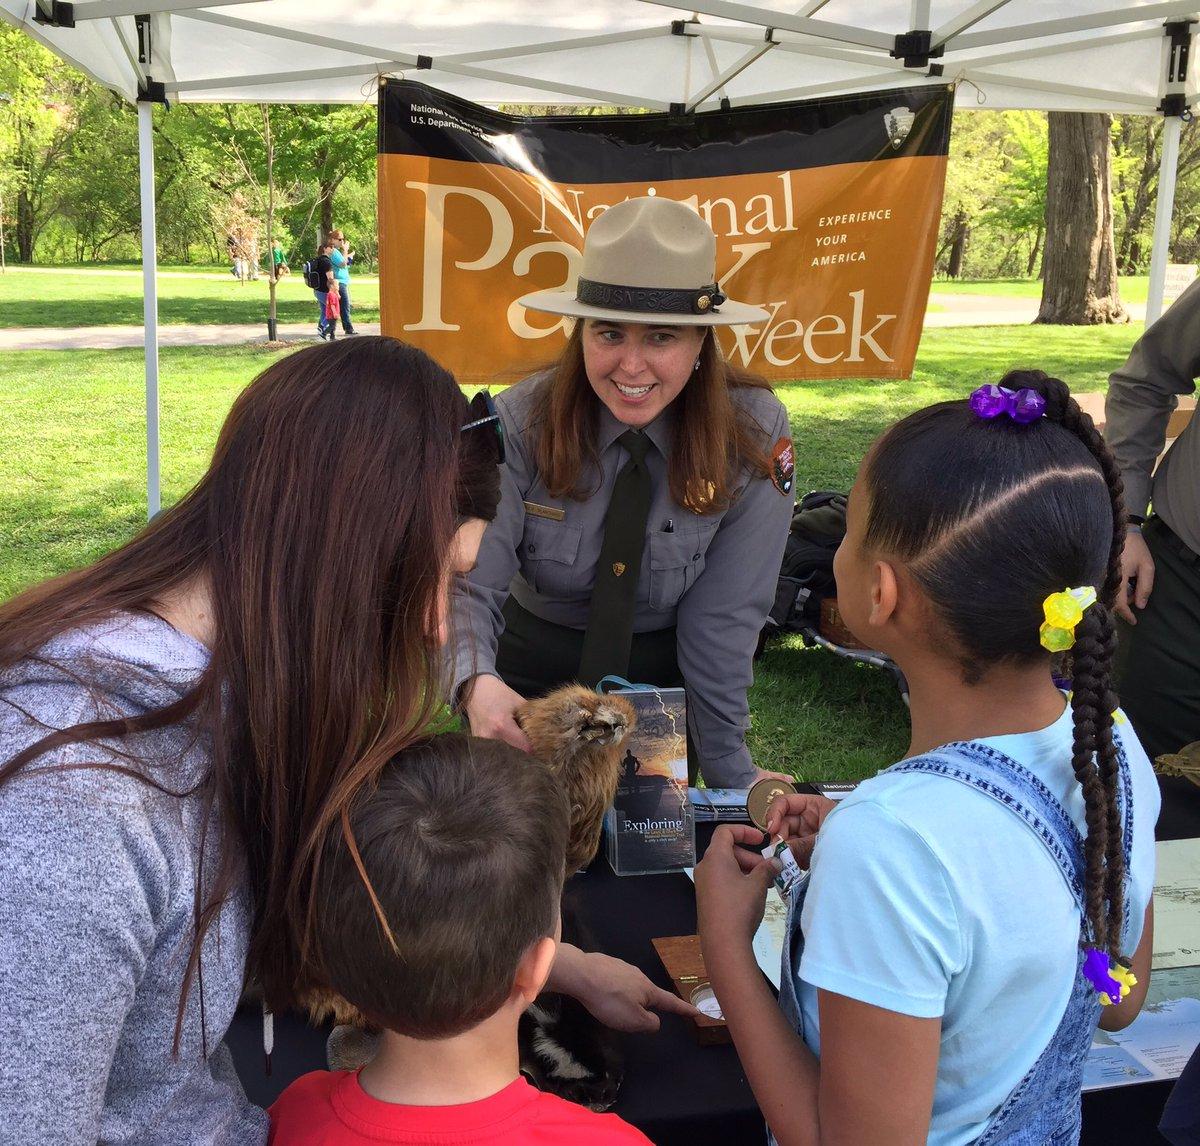 What a perfect  day to celebrate #EarthDay  in #Omaha #NE! #ParkWeek #FindYourPark #NPS101 @EarthDayOmaha<br>http://pic.twitter.com/pAdBLbYlTd